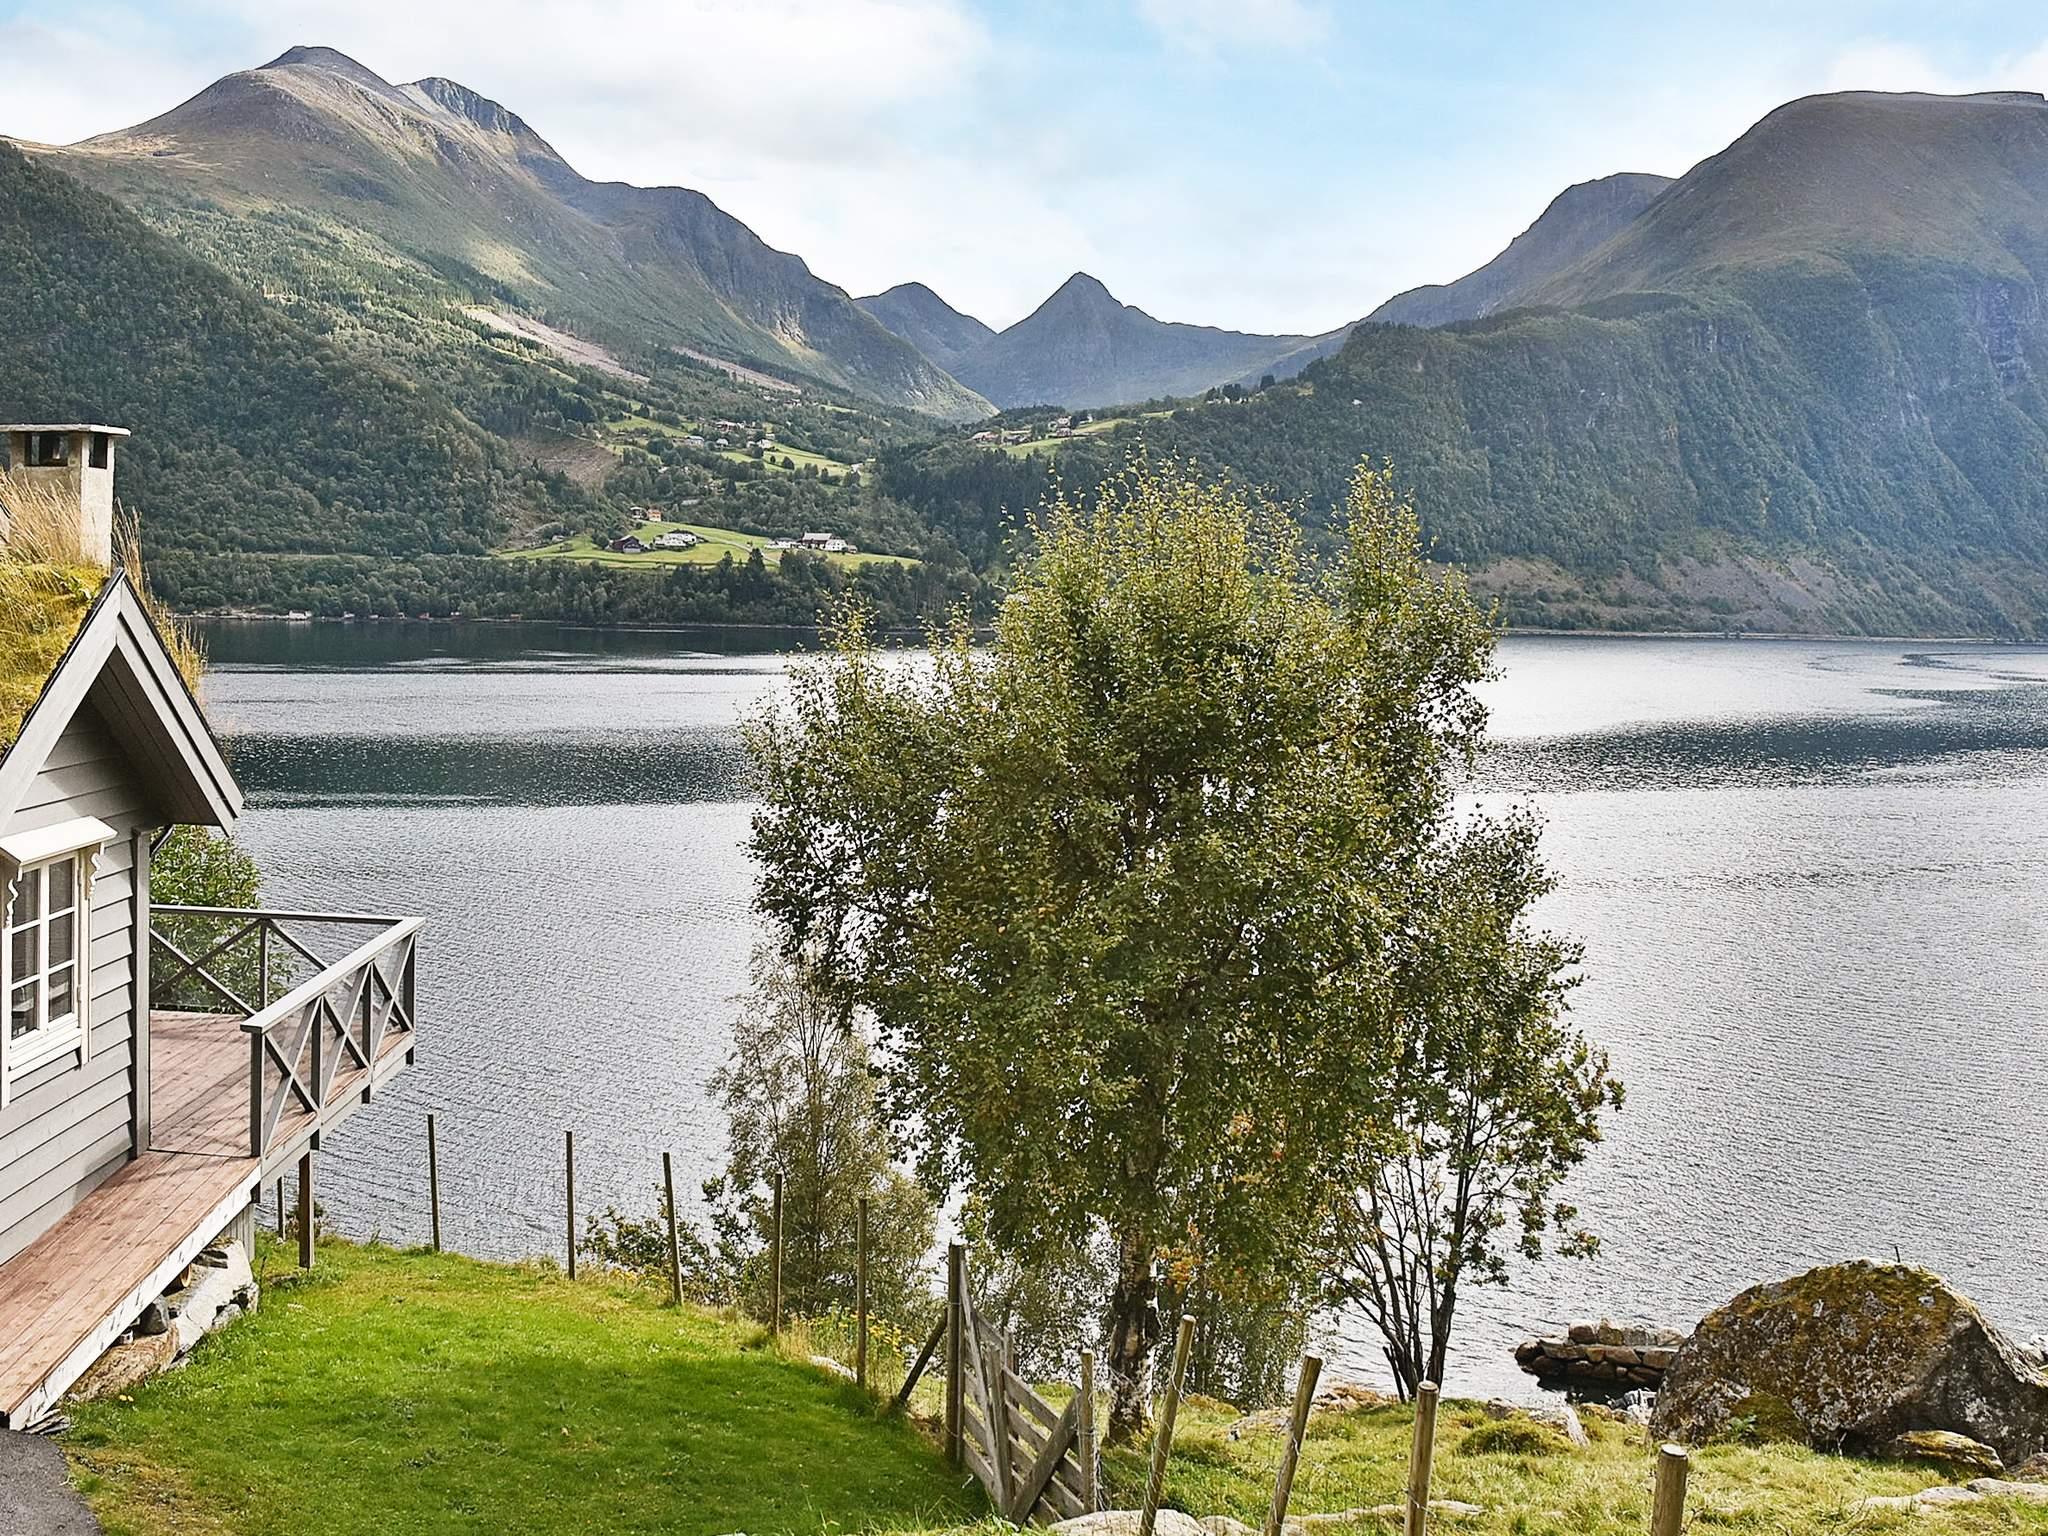 Ferienhaus Innselsetbygda (1043168), Lauvstad, More - Romsdal, Westnorwegen, Norwegen, Bild 22